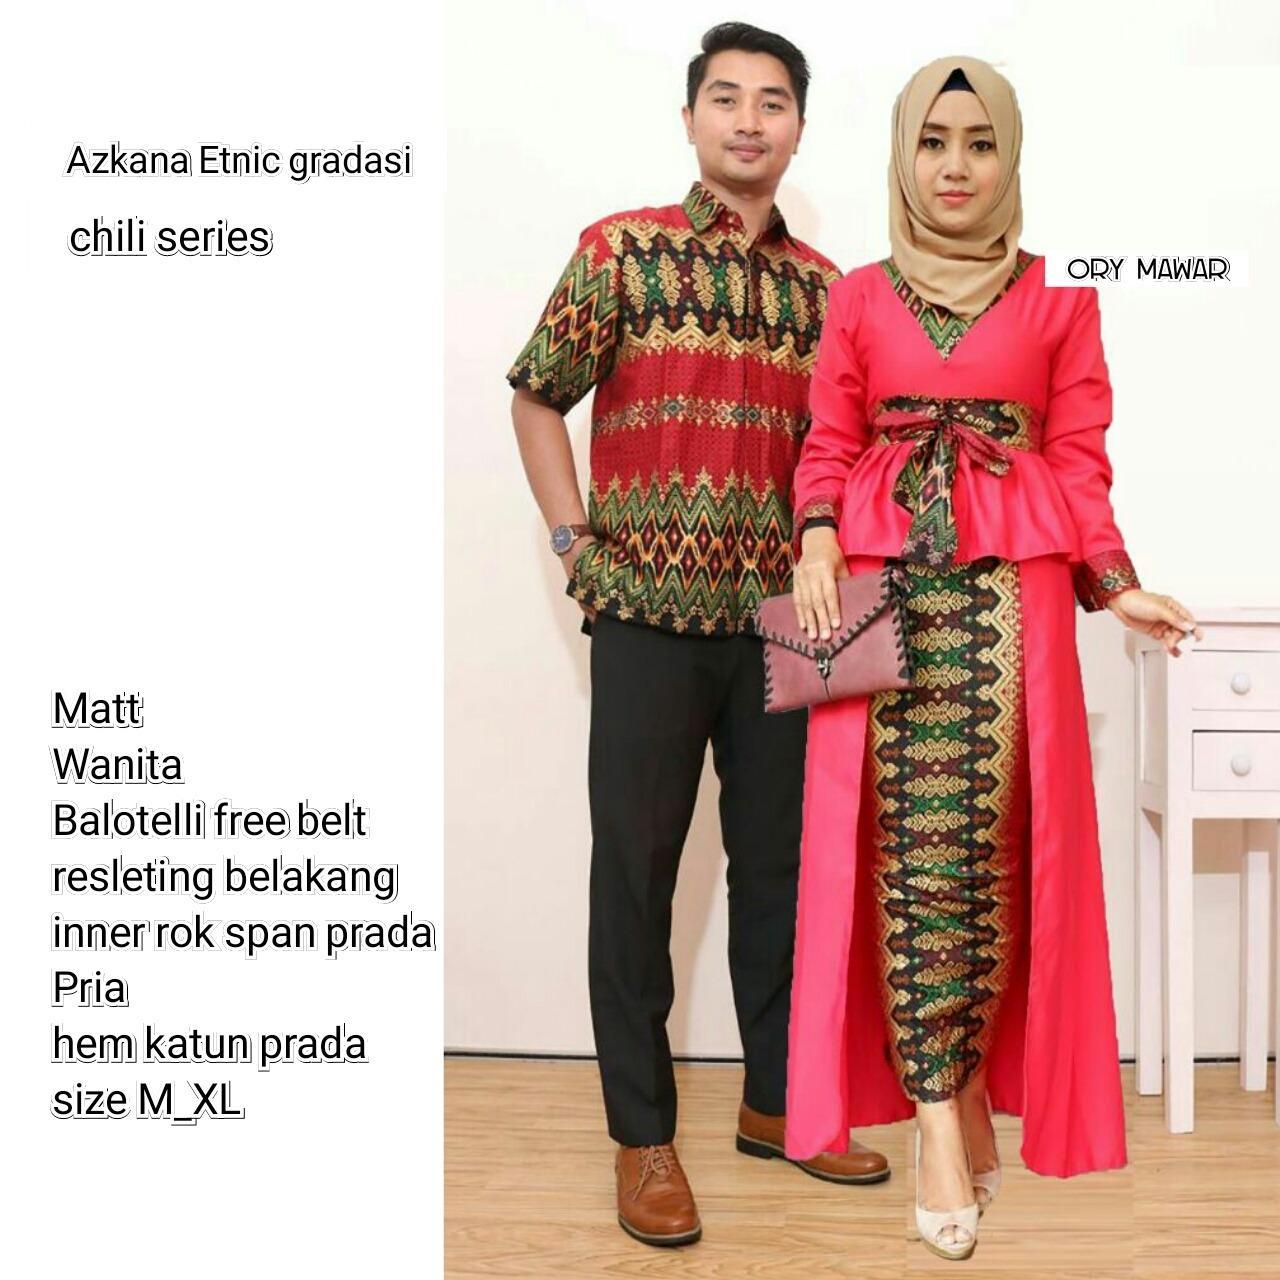 Batik Couple / Couple Batik / Baju Muslim Wanita Terbaru 2018 / Gamis Wanita Terbaru / Batik Sarimbit Azkana Gradasi Couple